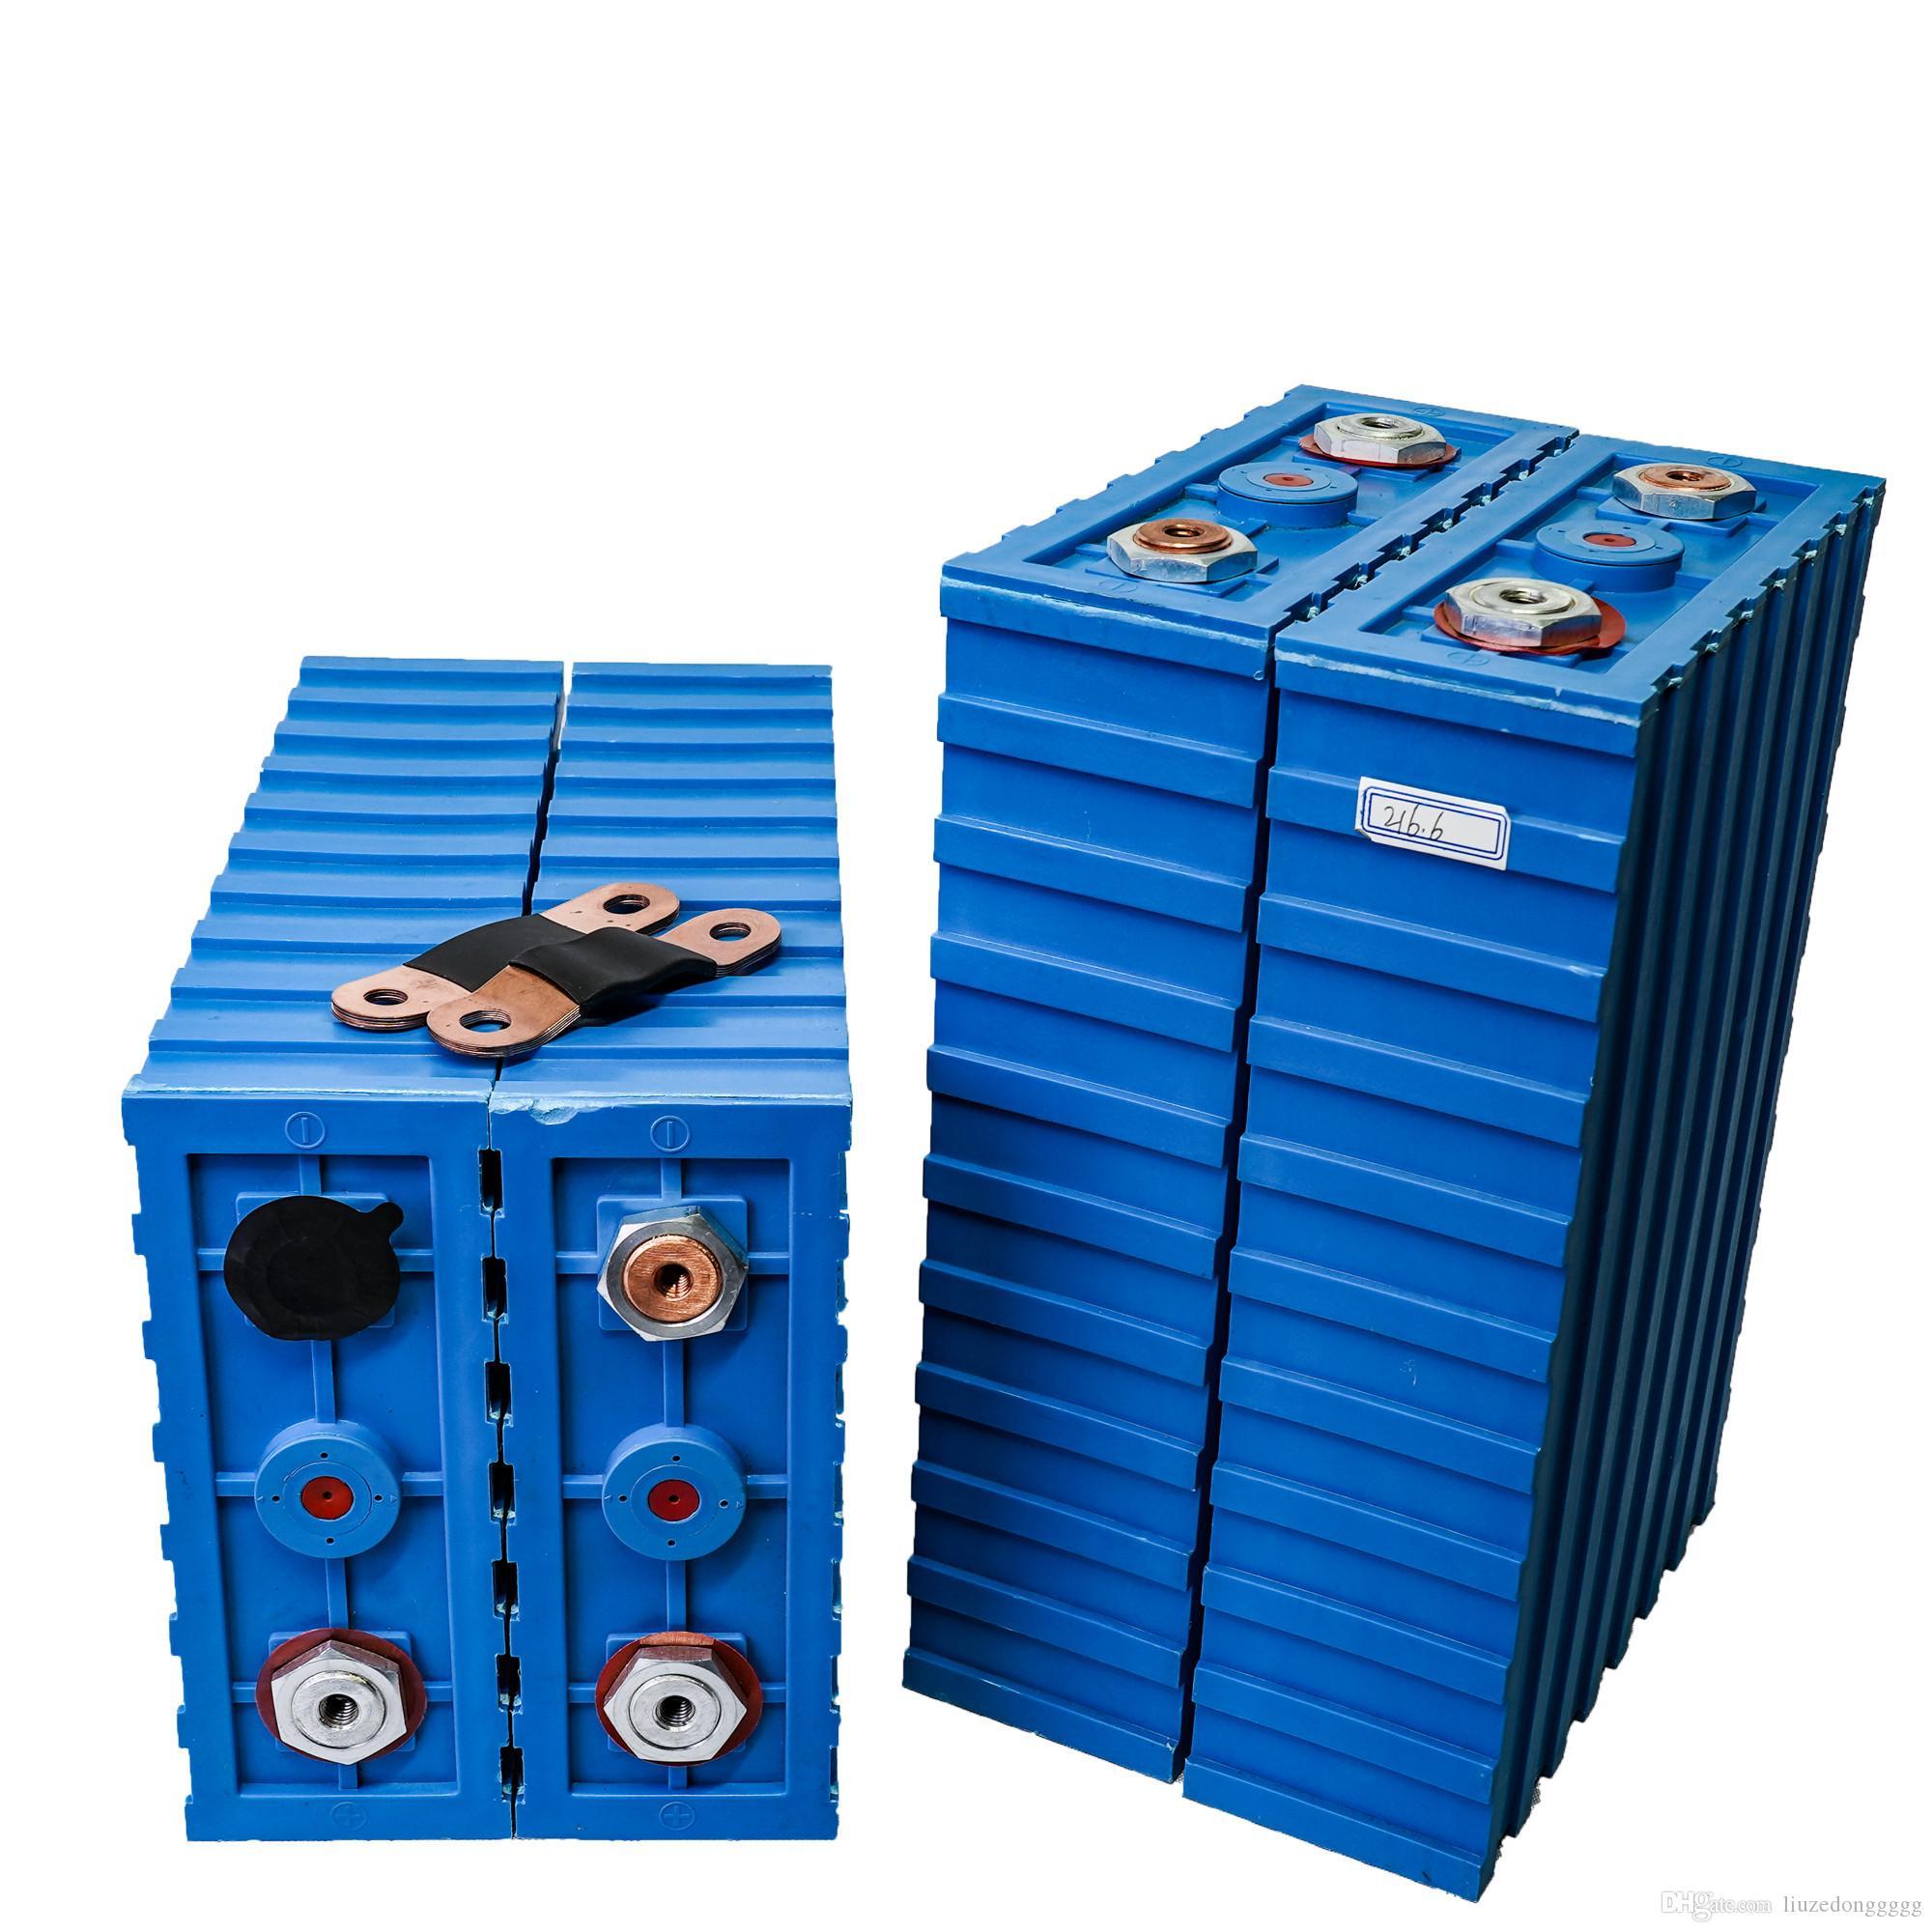 Brandneuer LIFEPO4 200AH Batteriezelle CALB 200Ah 3.2V